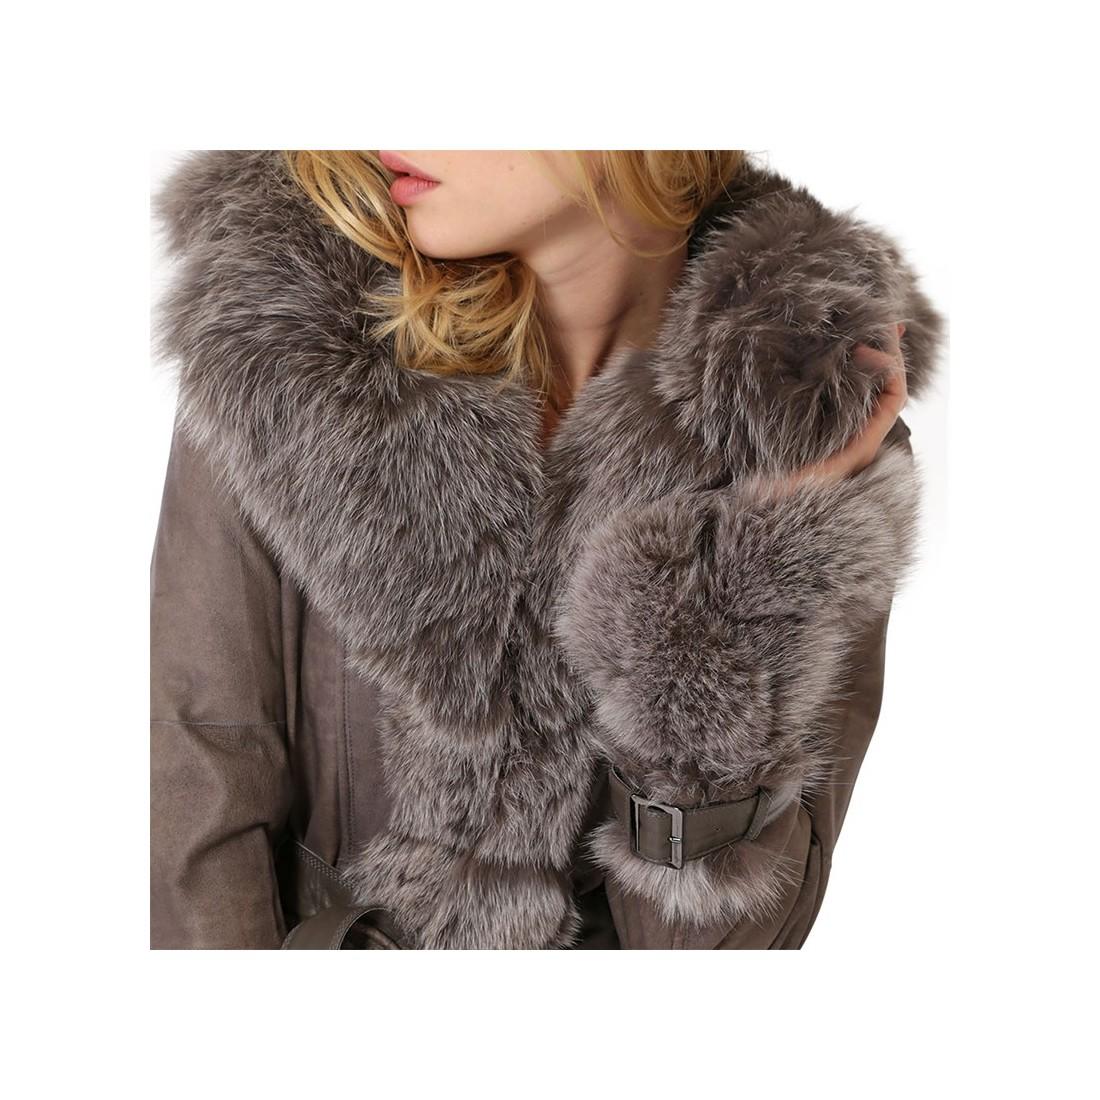 manteau newty giovanni en fourrure femme taupe